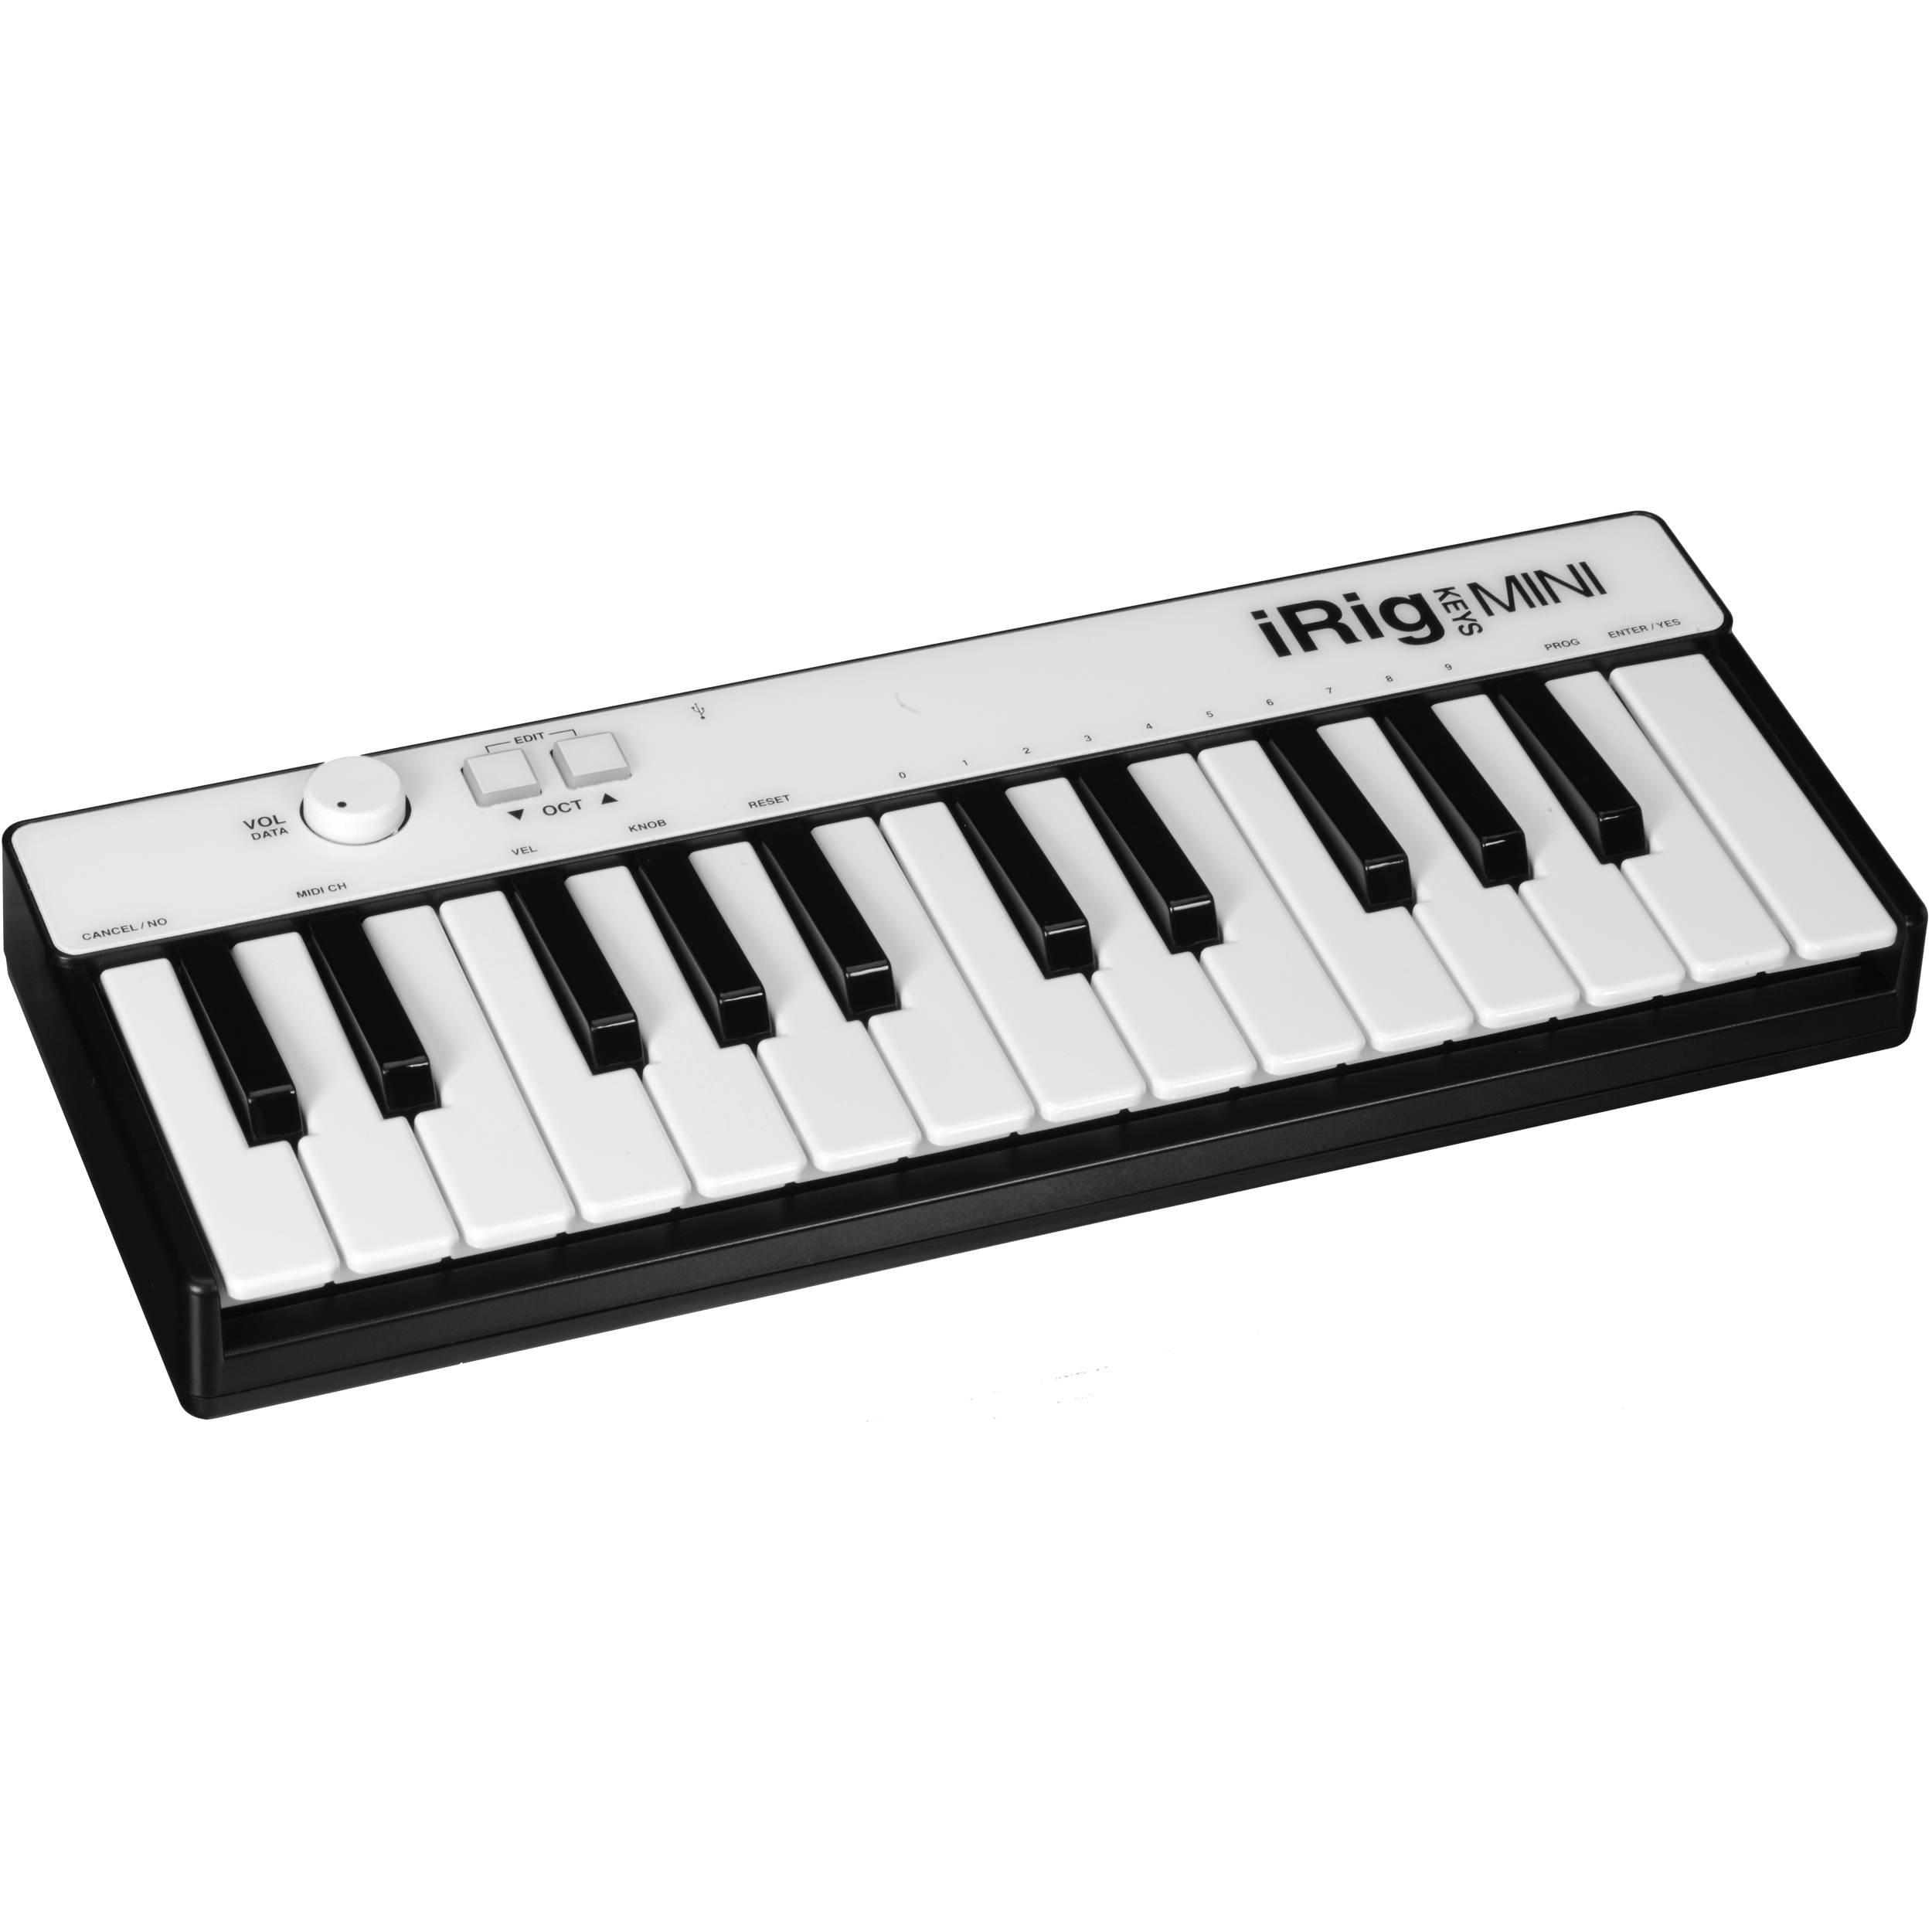 IK Multimedia iRig Keys Mini MIDI Controller for iPhone, iPod touch, iPad &  Mac/PC